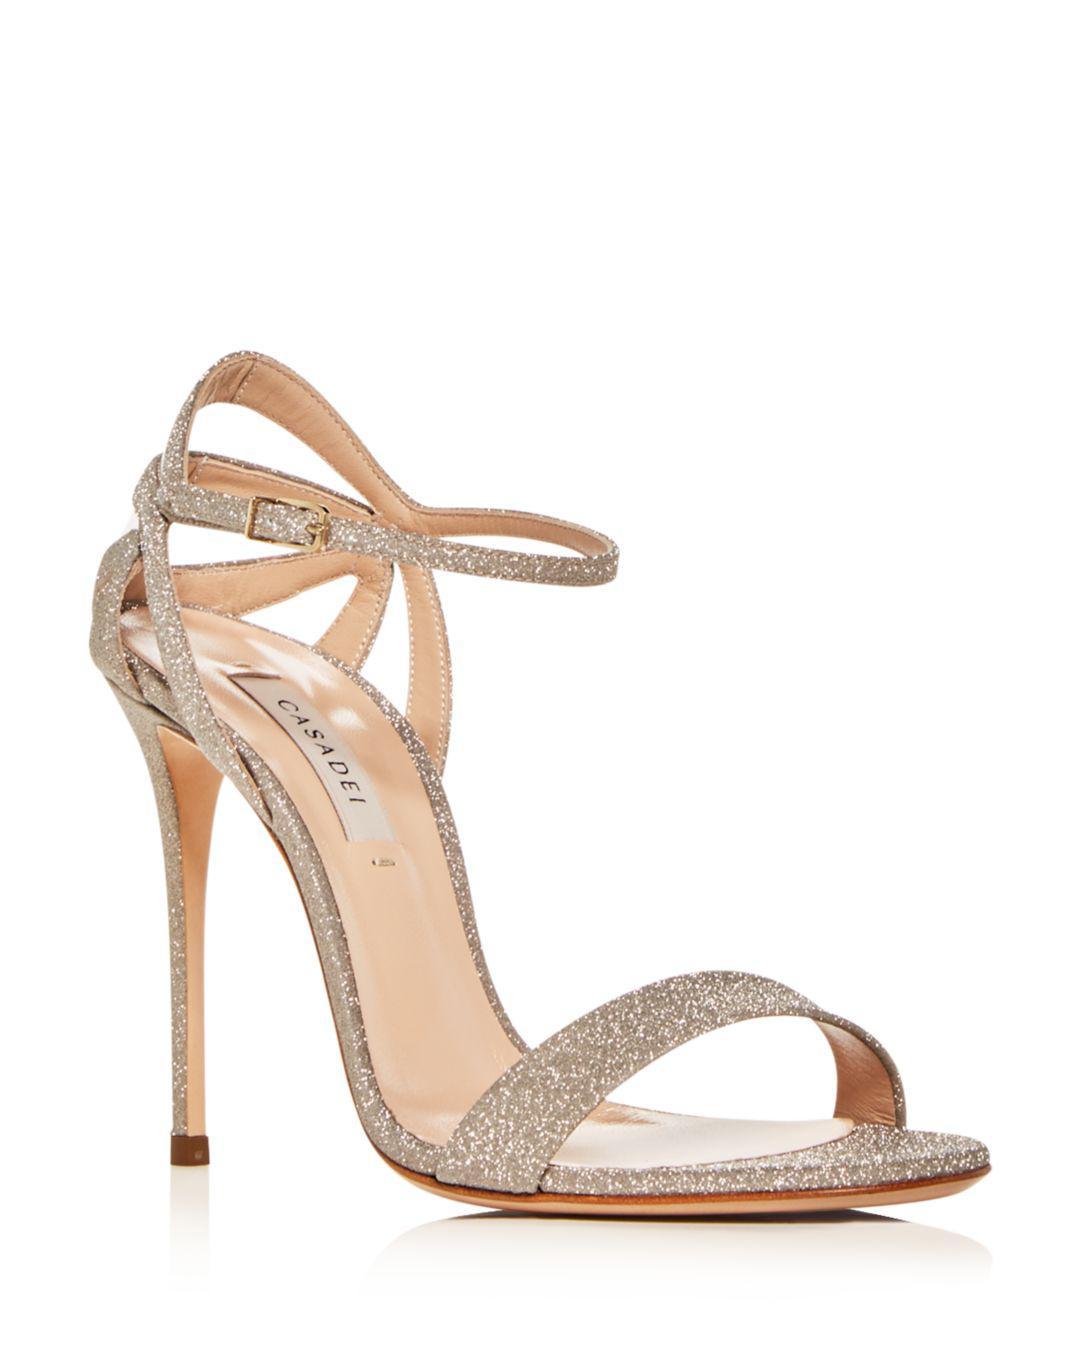 Casadei Women s Glitter Ankle-strap High-heel Sandals - Lyst 46e63dd9f3f